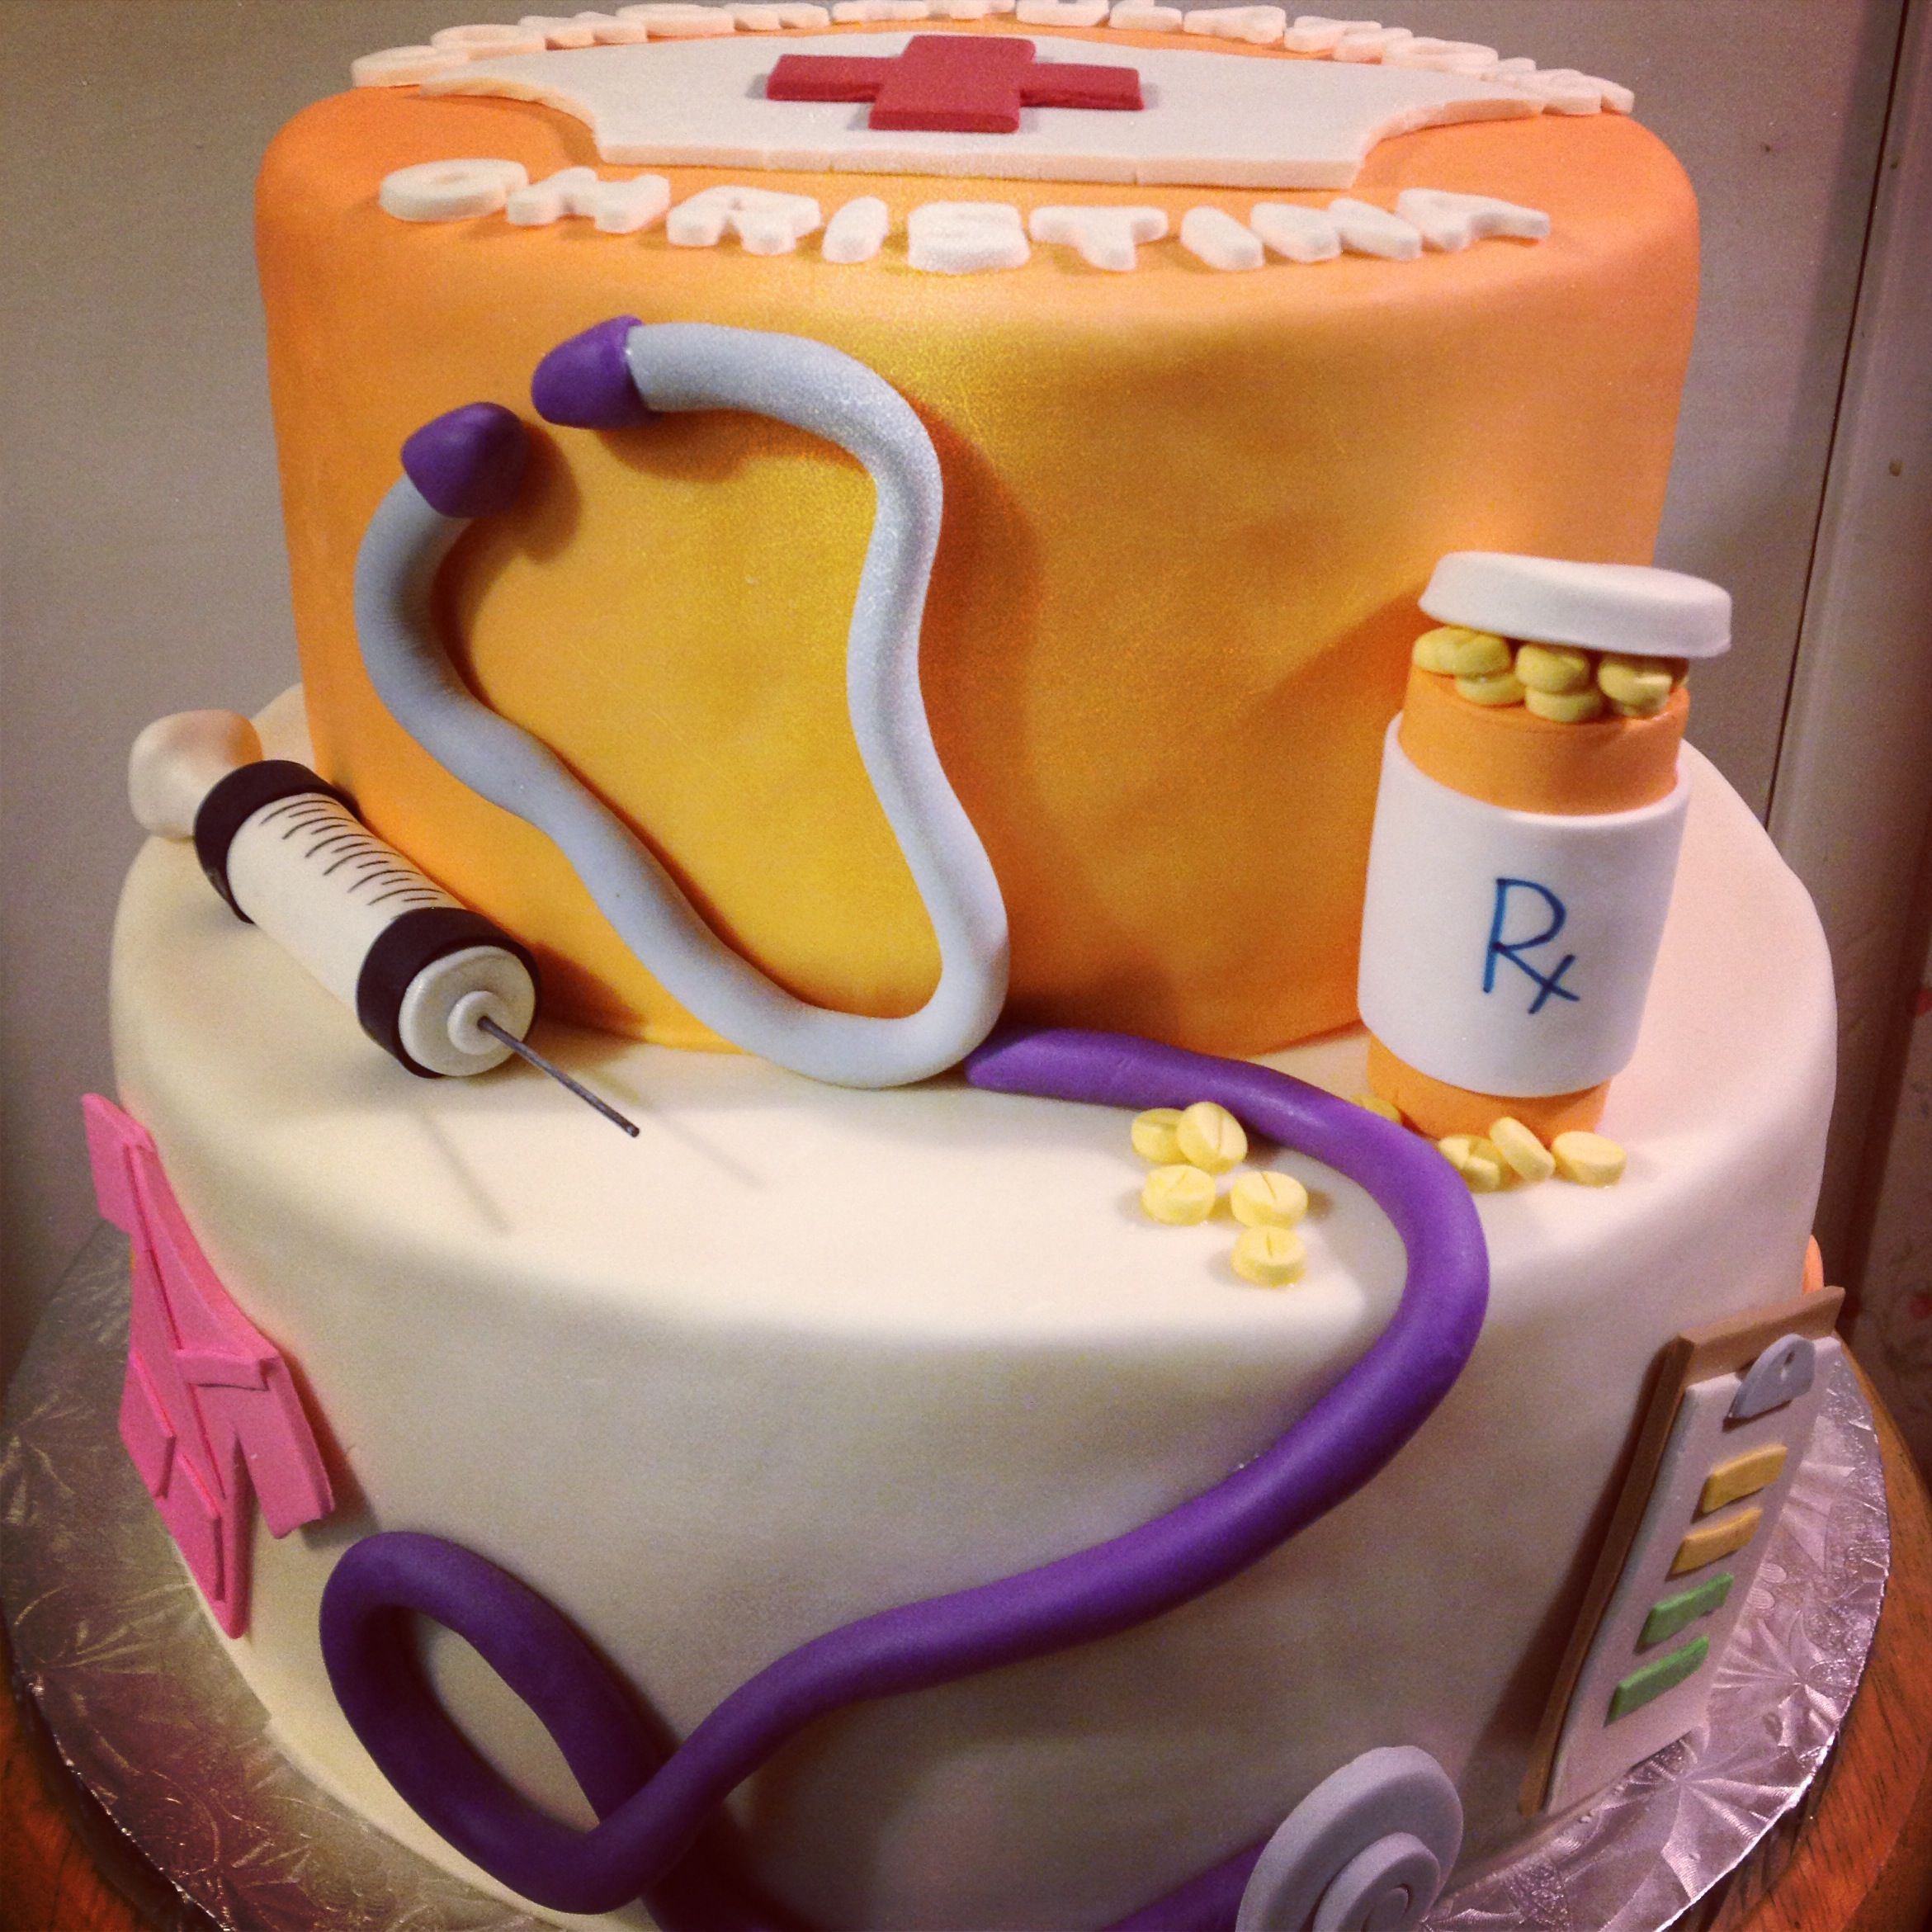 Nursing Cake Decoration Ideas : Nursing School Graduation Cake - Cake for a nursing ...